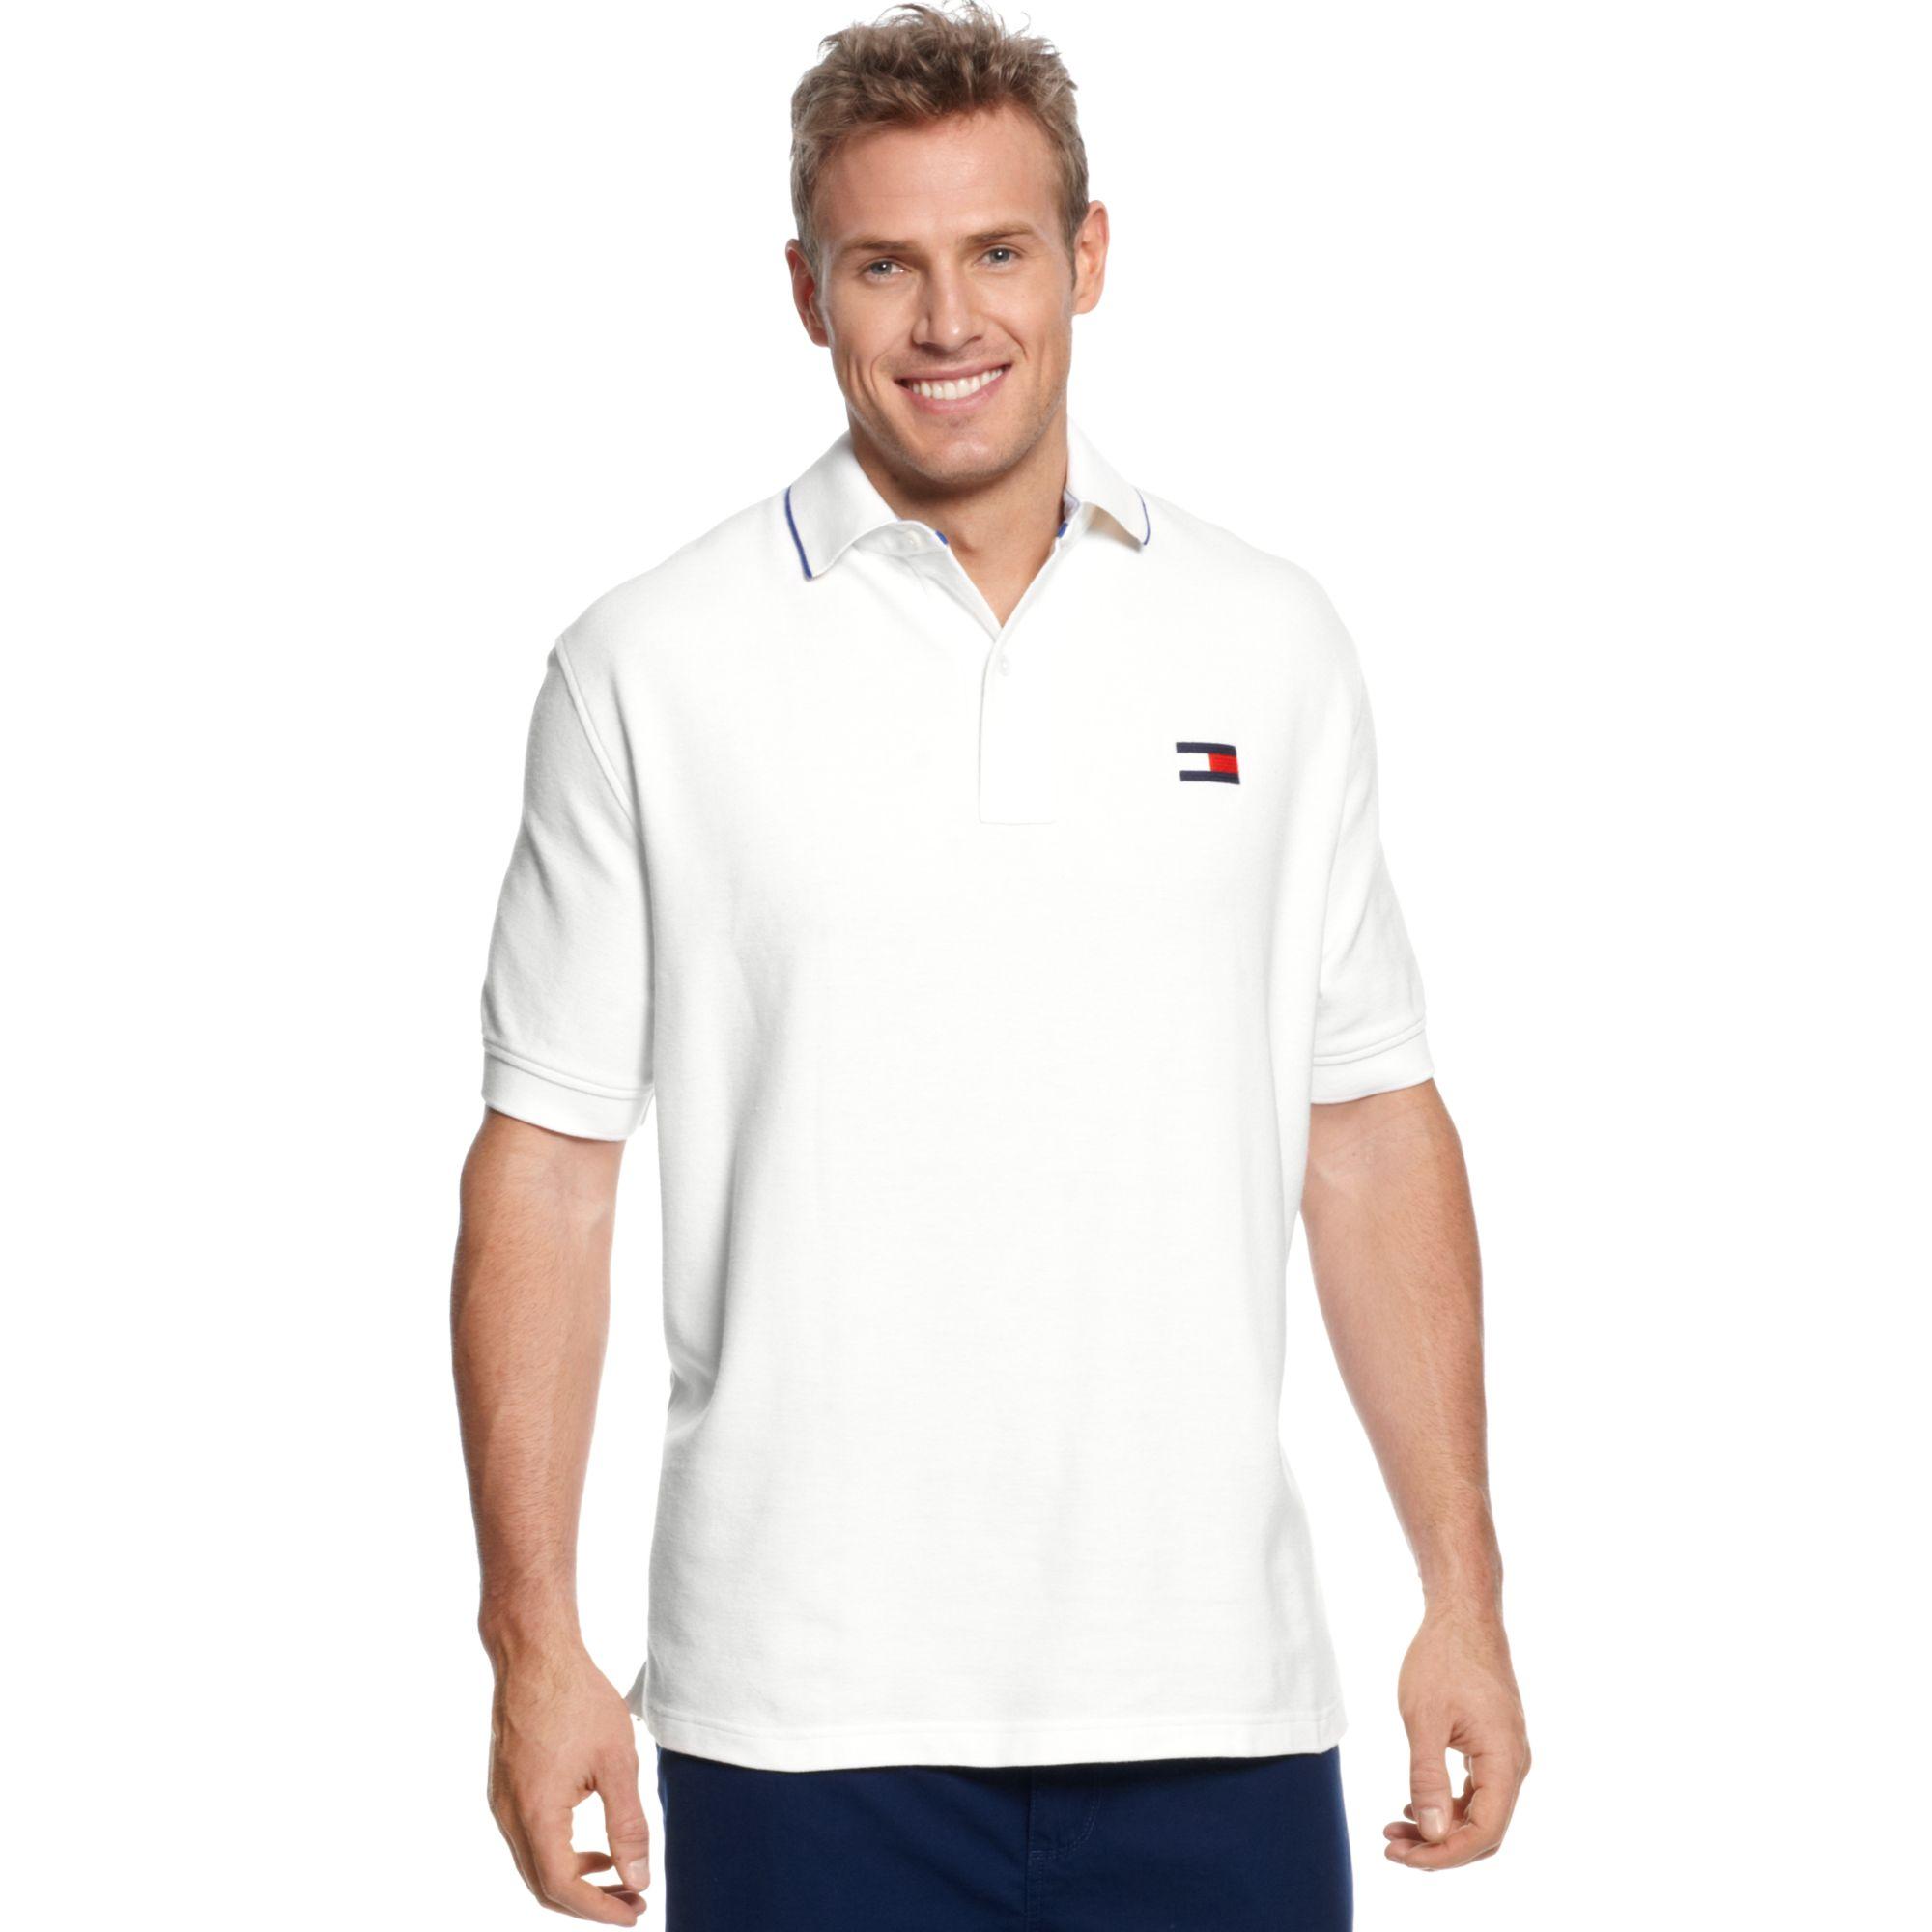 tommy hilfiger sydney polo shirt in white for men classic. Black Bedroom Furniture Sets. Home Design Ideas